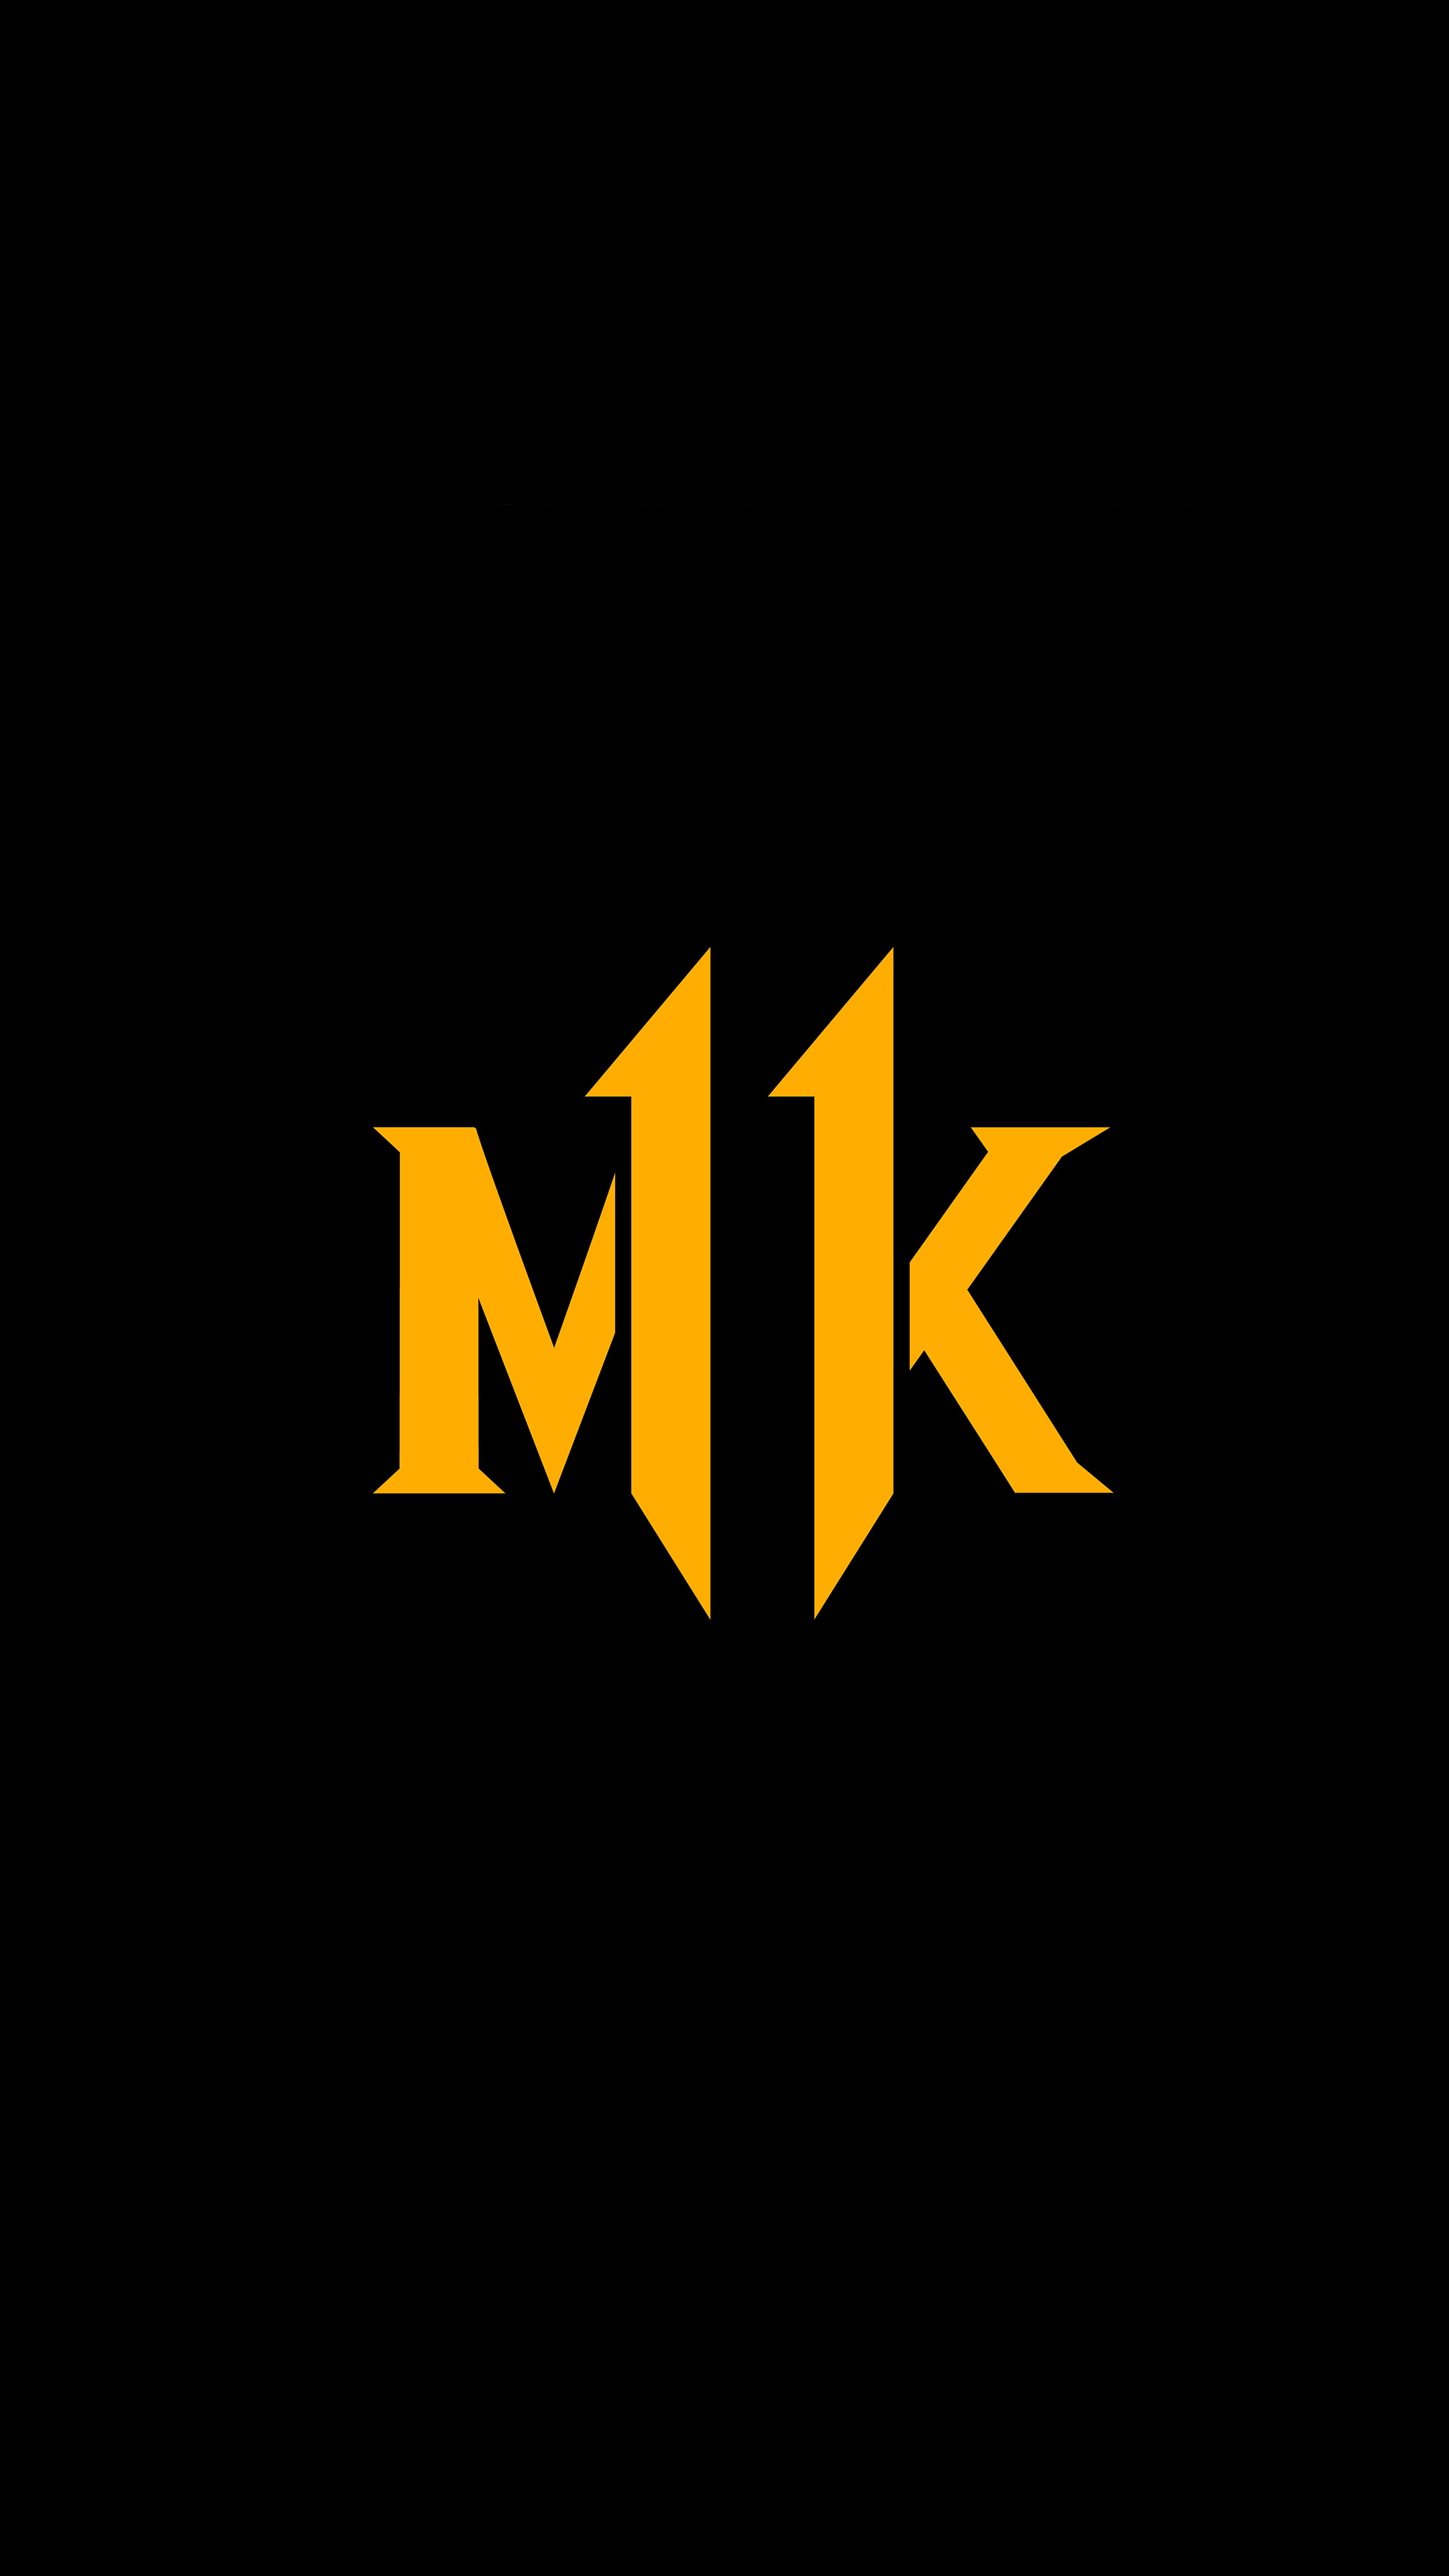 Mortal Kombat 11 Minimal 4k Ultra Hd Mobile Wallpaper